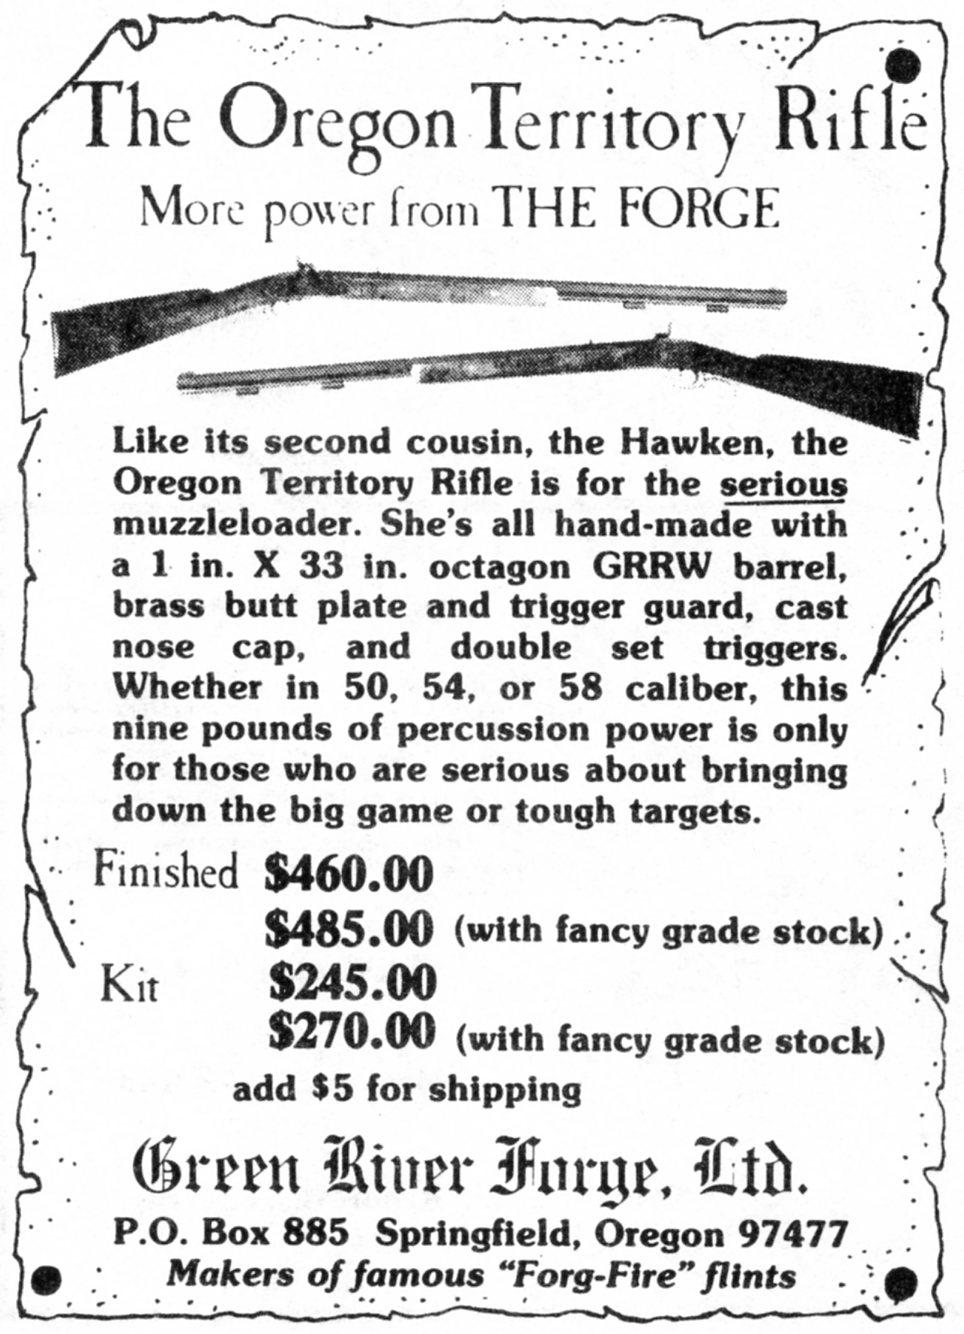 Green River Forge, Ltd ad